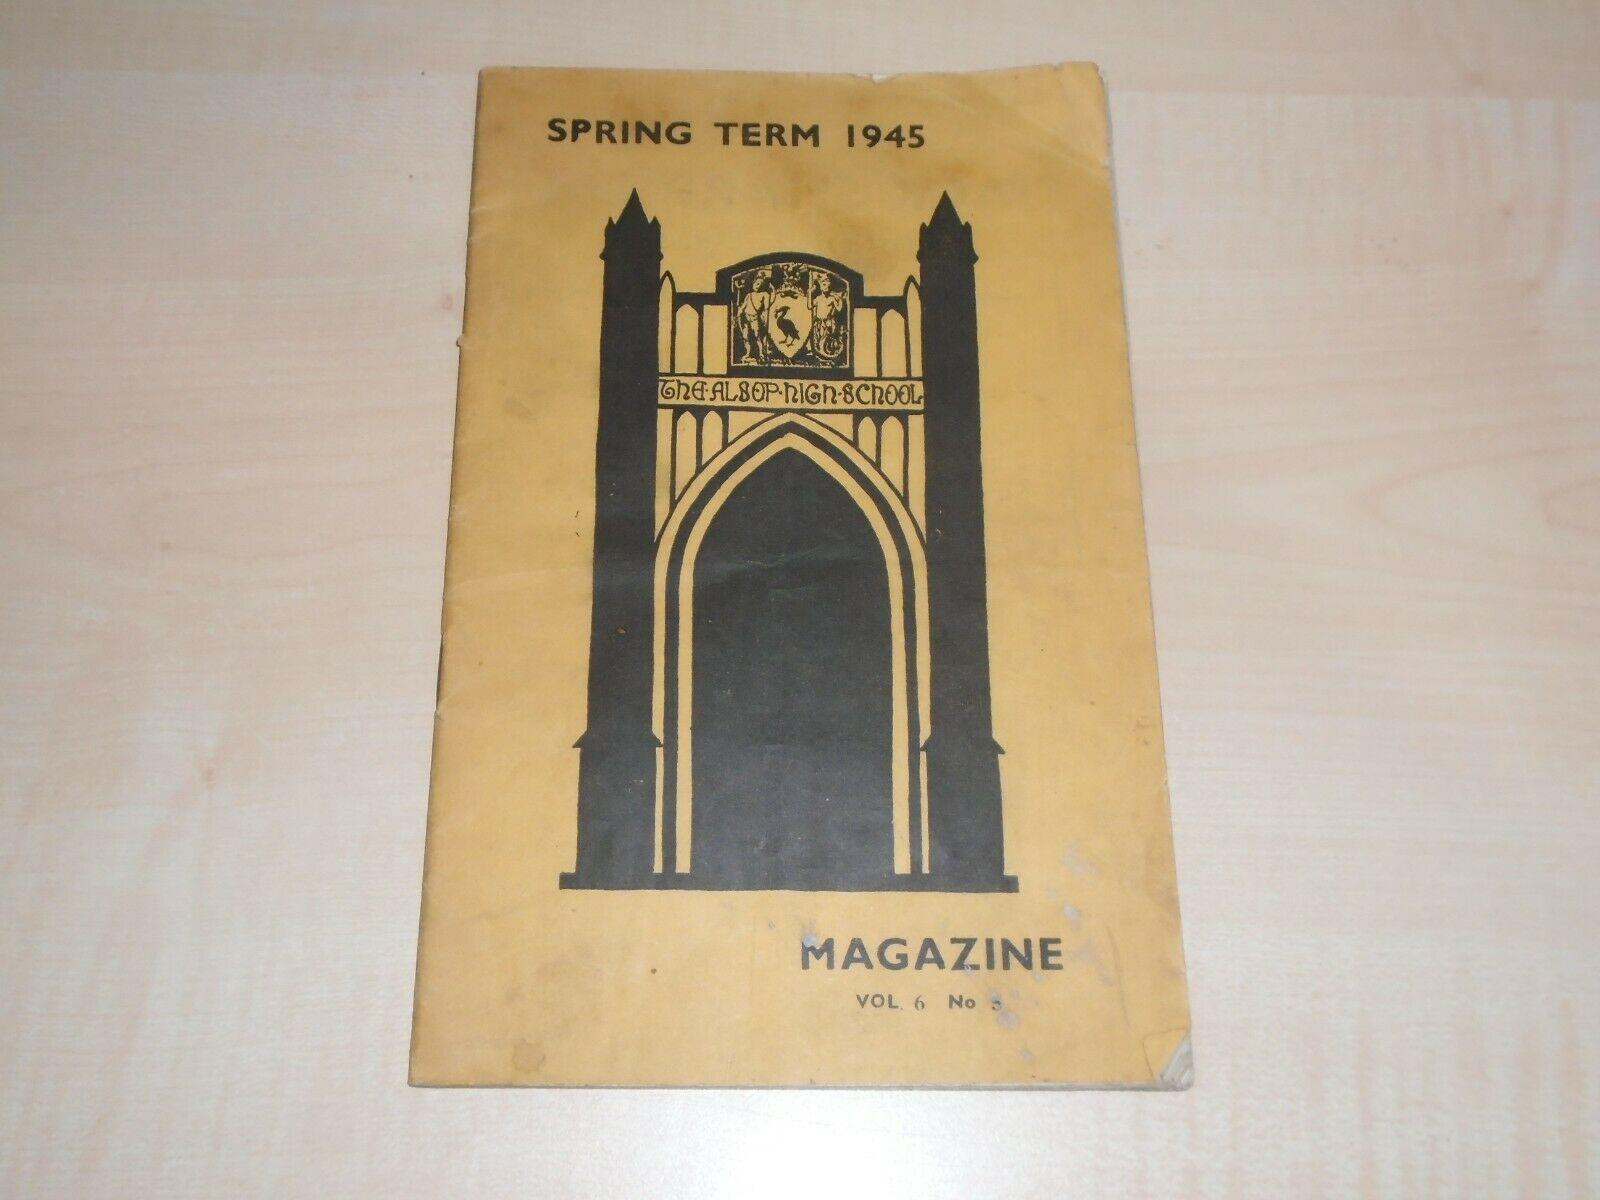 Liverpool Alsop High School Magazine, March 1945 including Arnhem casulties (collection P. Reinders)